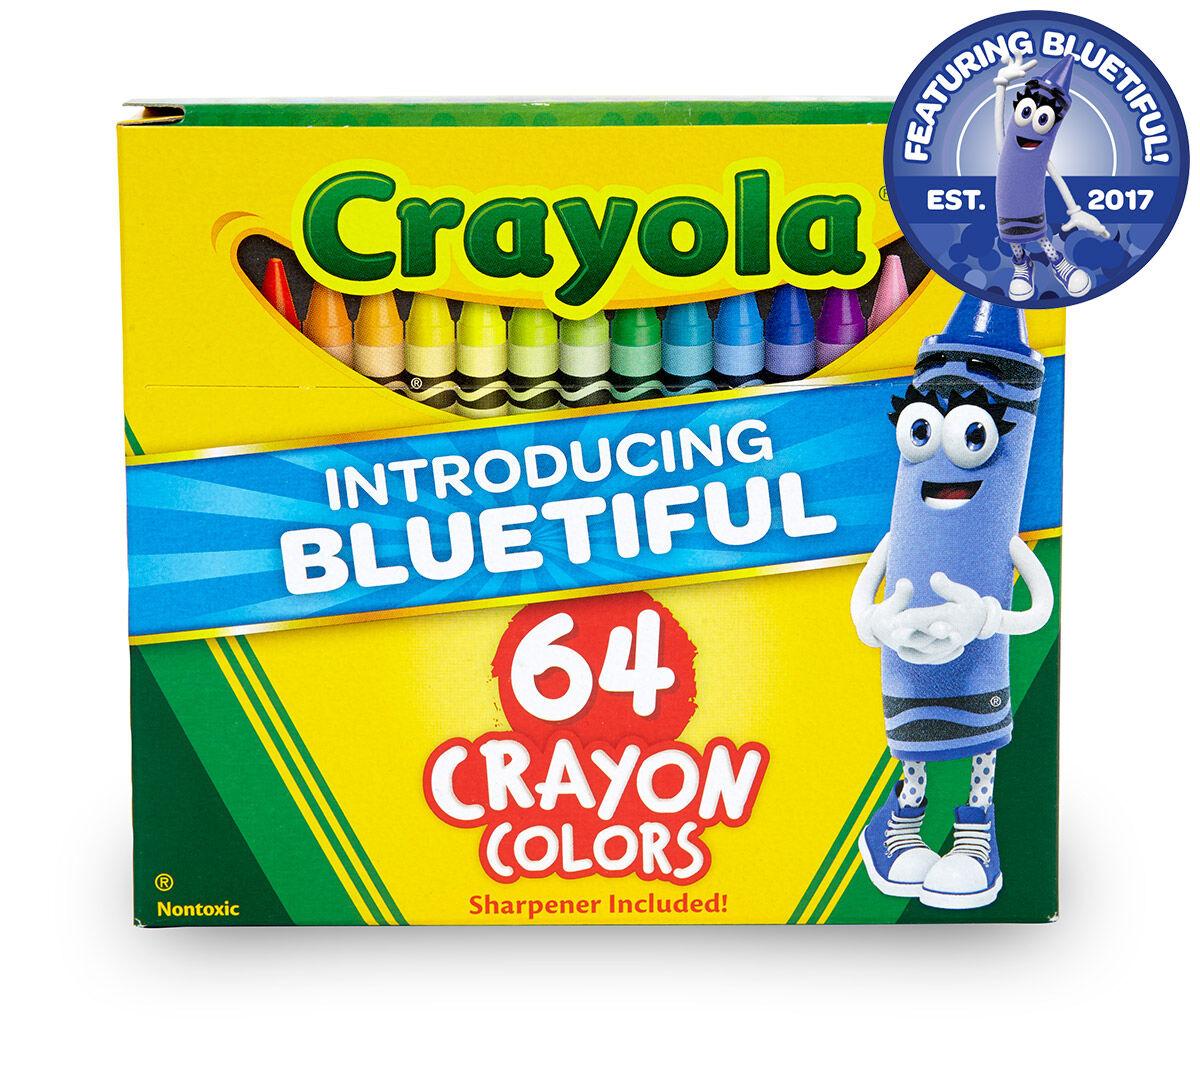 Bluetiful New Crayola Color Products Crayolacom